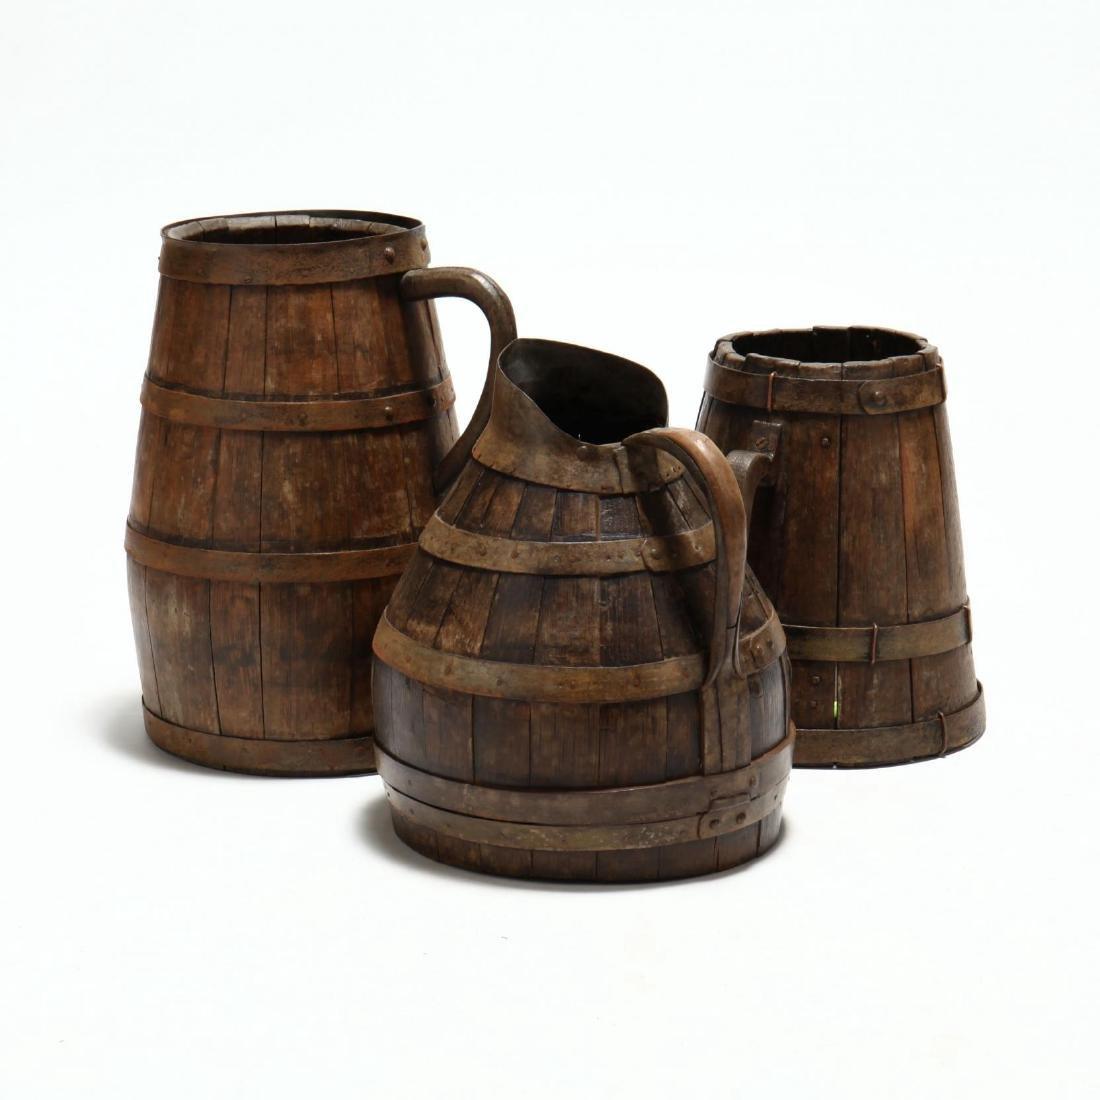 Three Antique Oak Handled Vessels - 4